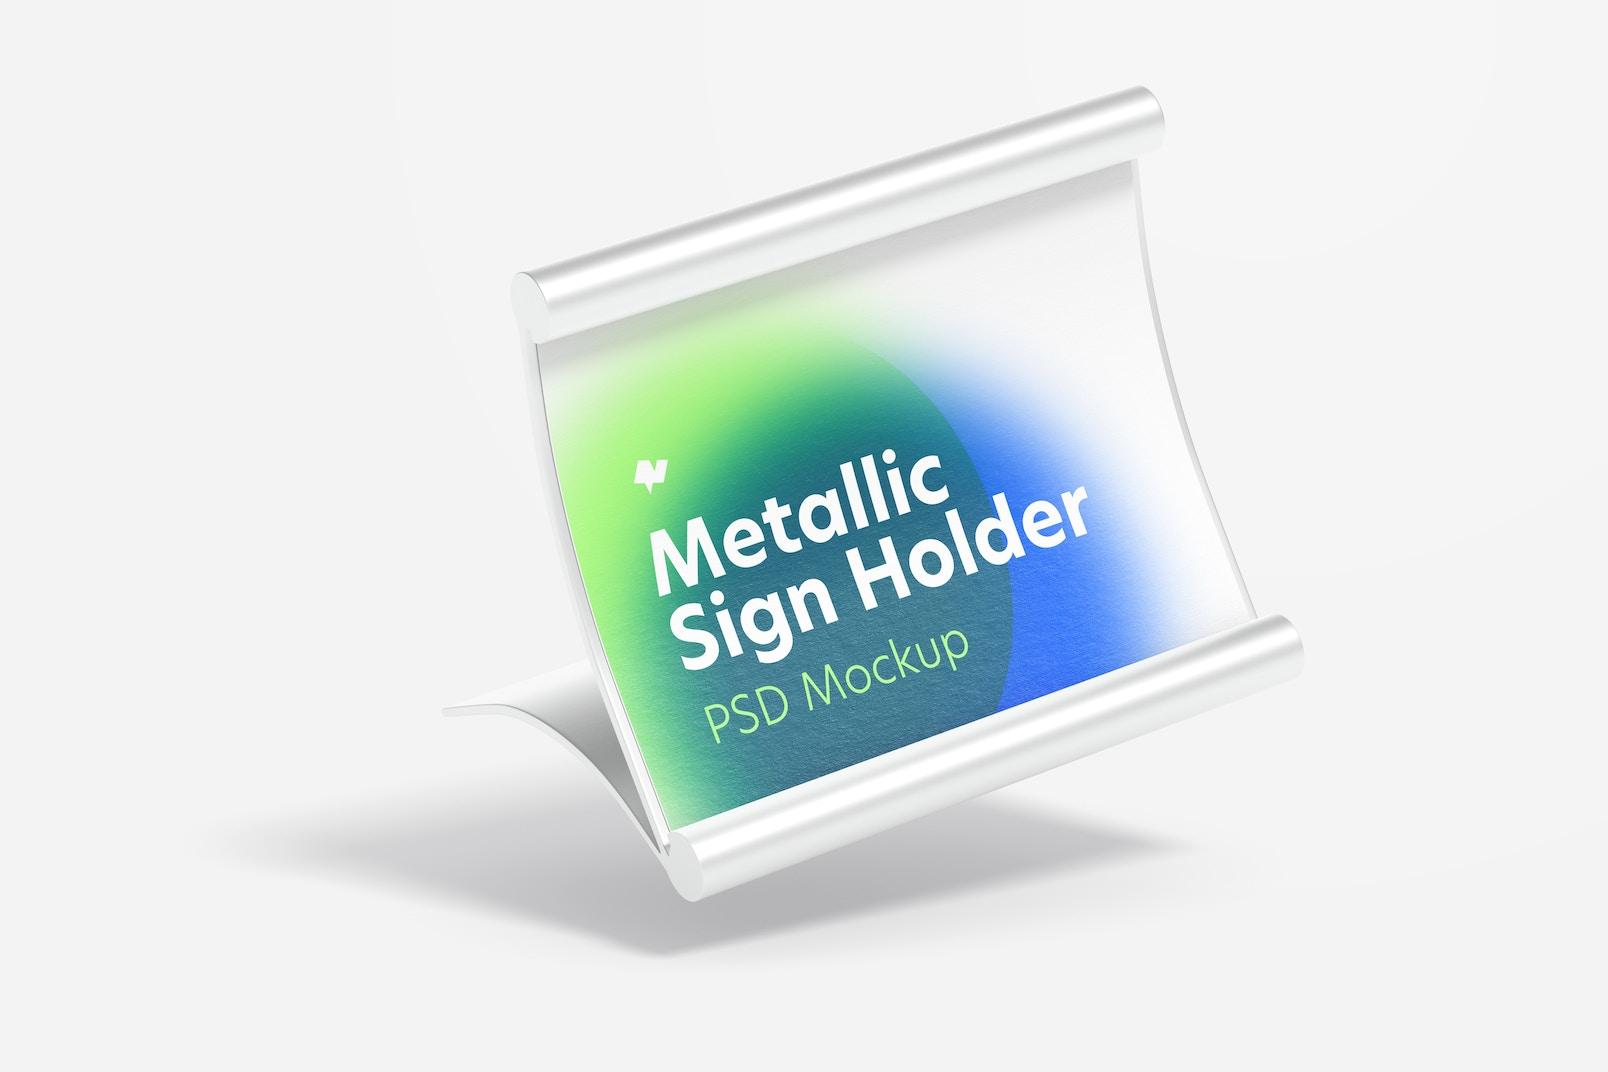 Metallic Table Sign Holder Mockup, Falling